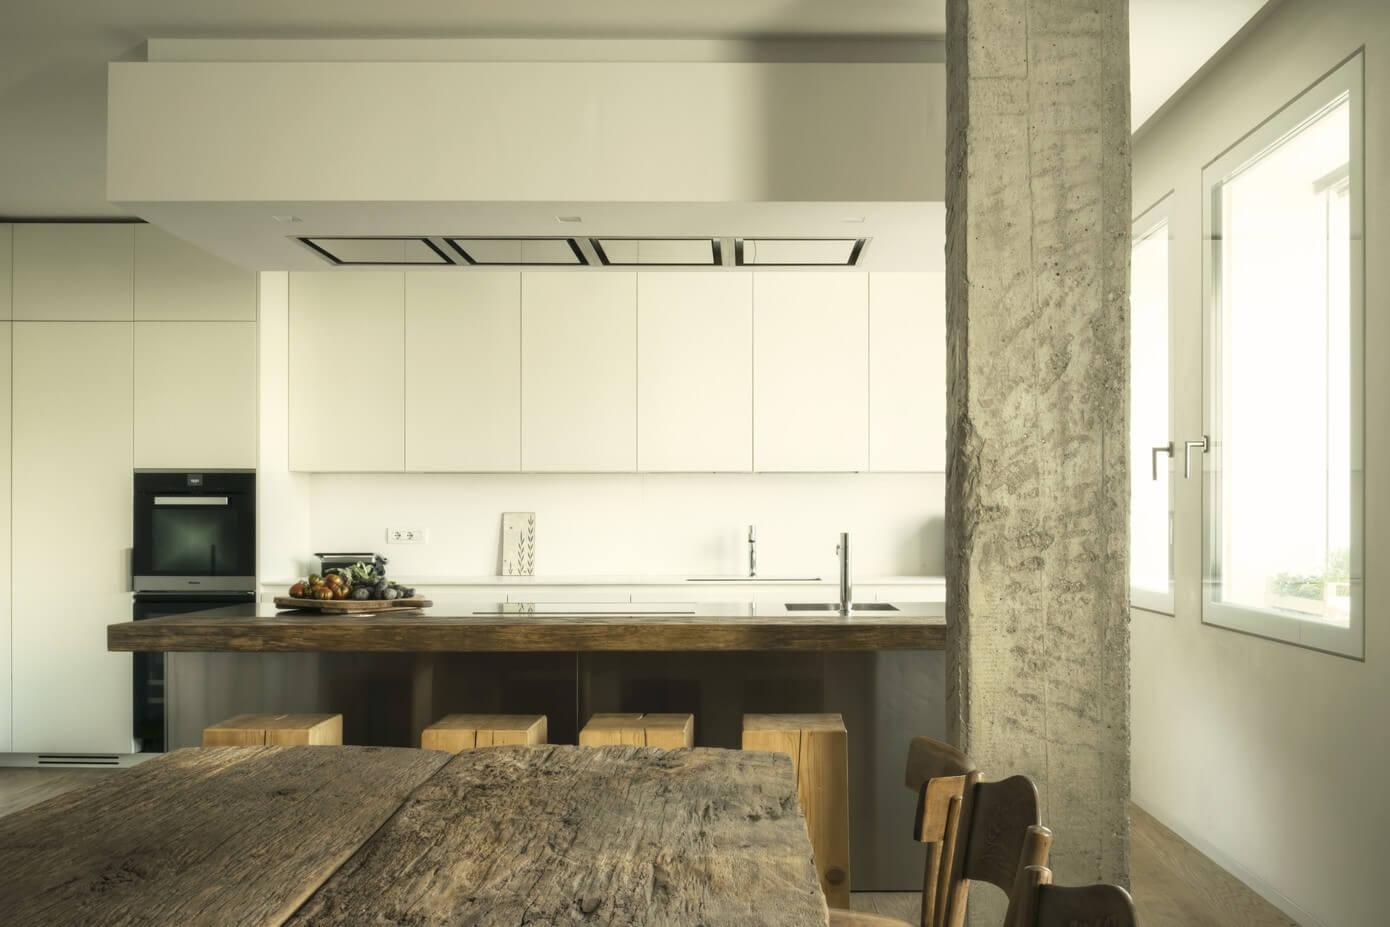 RG/RM Residence by Gobbo Architetti